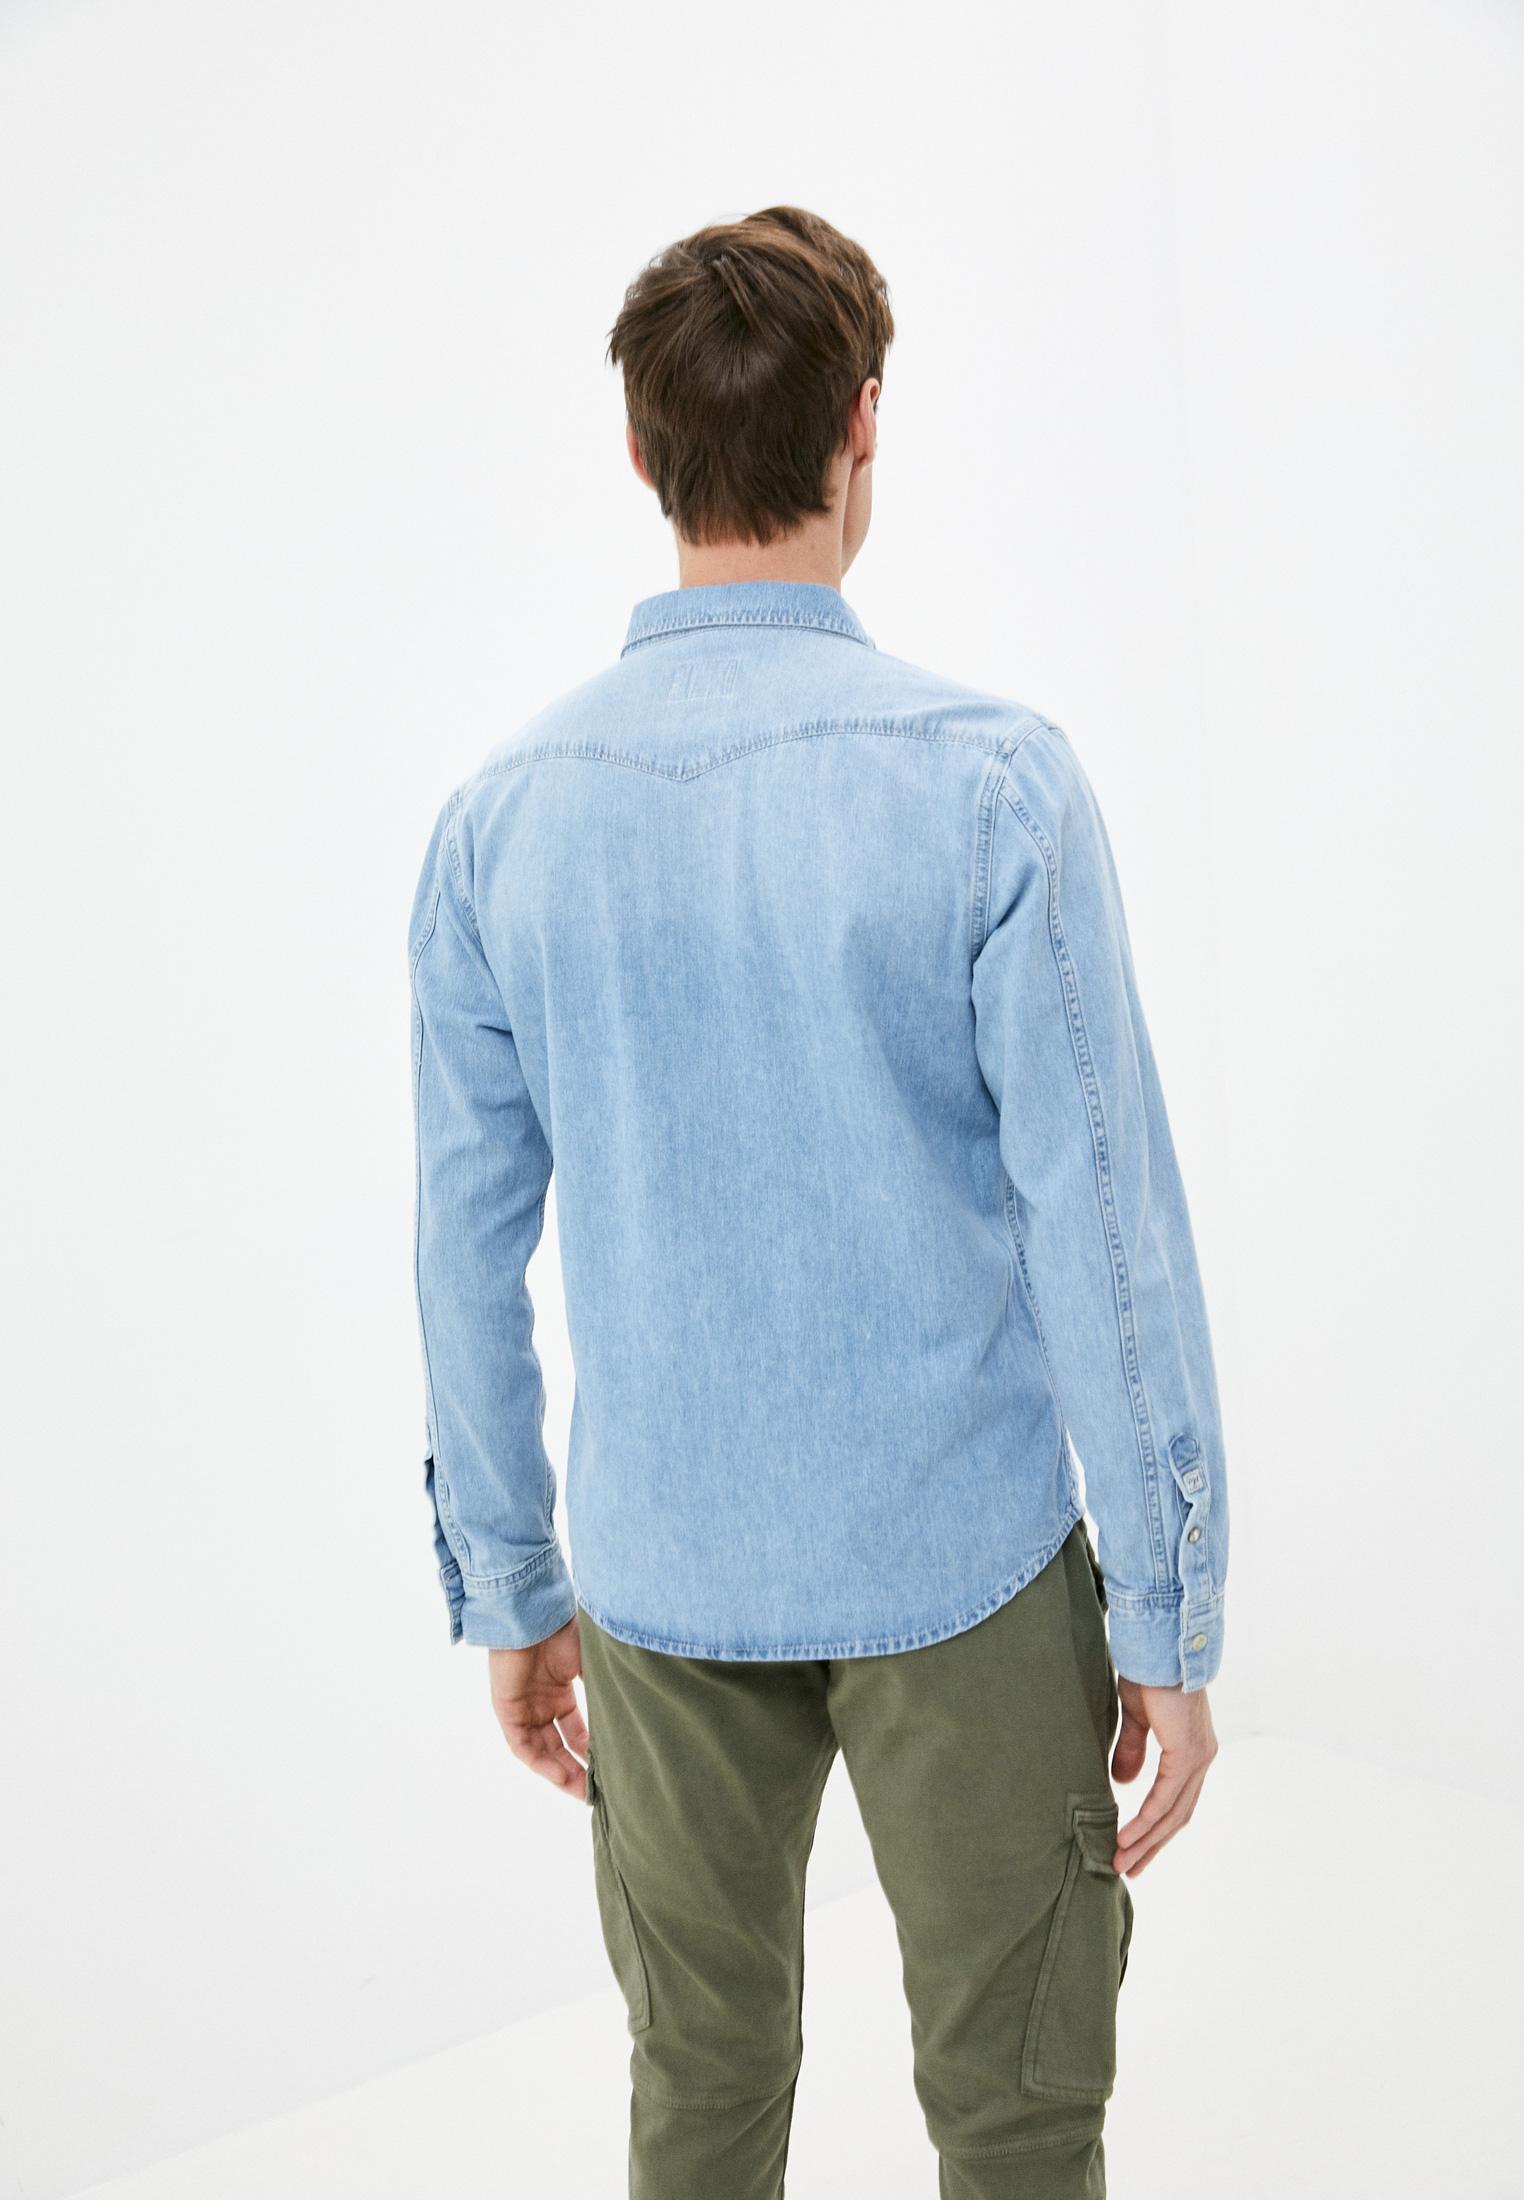 Рубашка Pepe Jeans (Пепе Джинс) PM307018: изображение 3